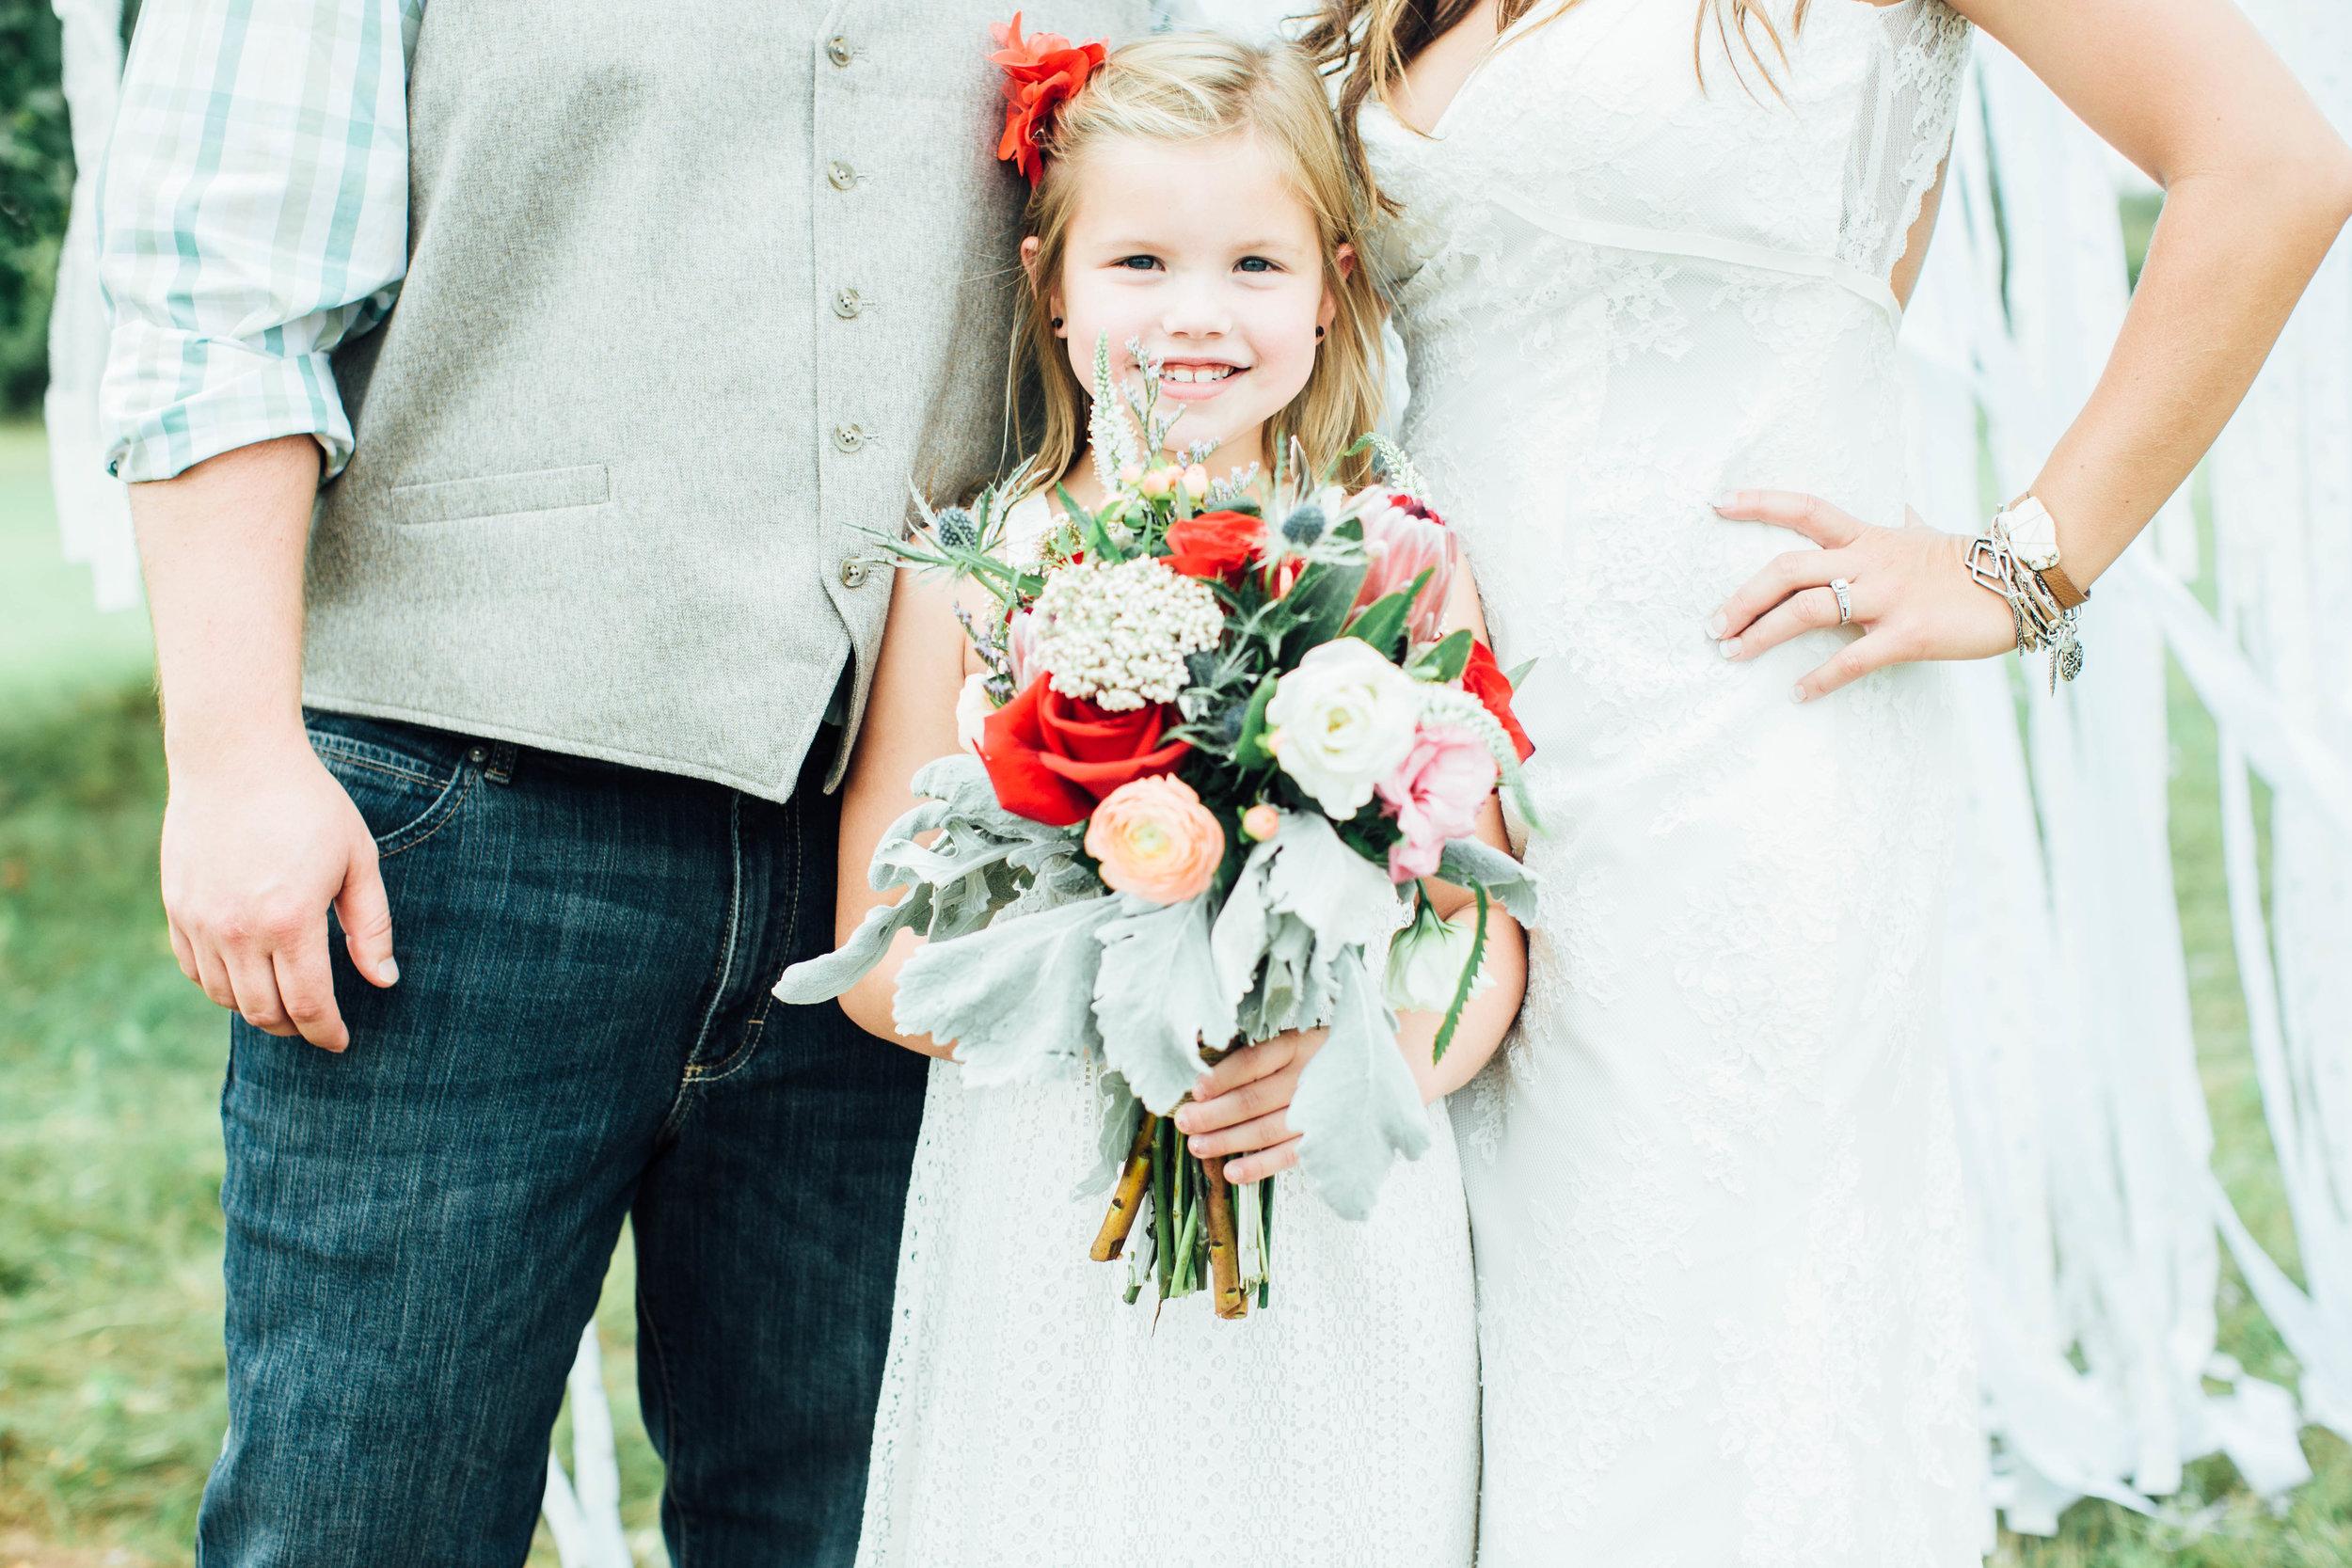 Bohemian Wedding - Sabrina Leigh Studios - Northern Michigan Wedding Photographer061.jpg